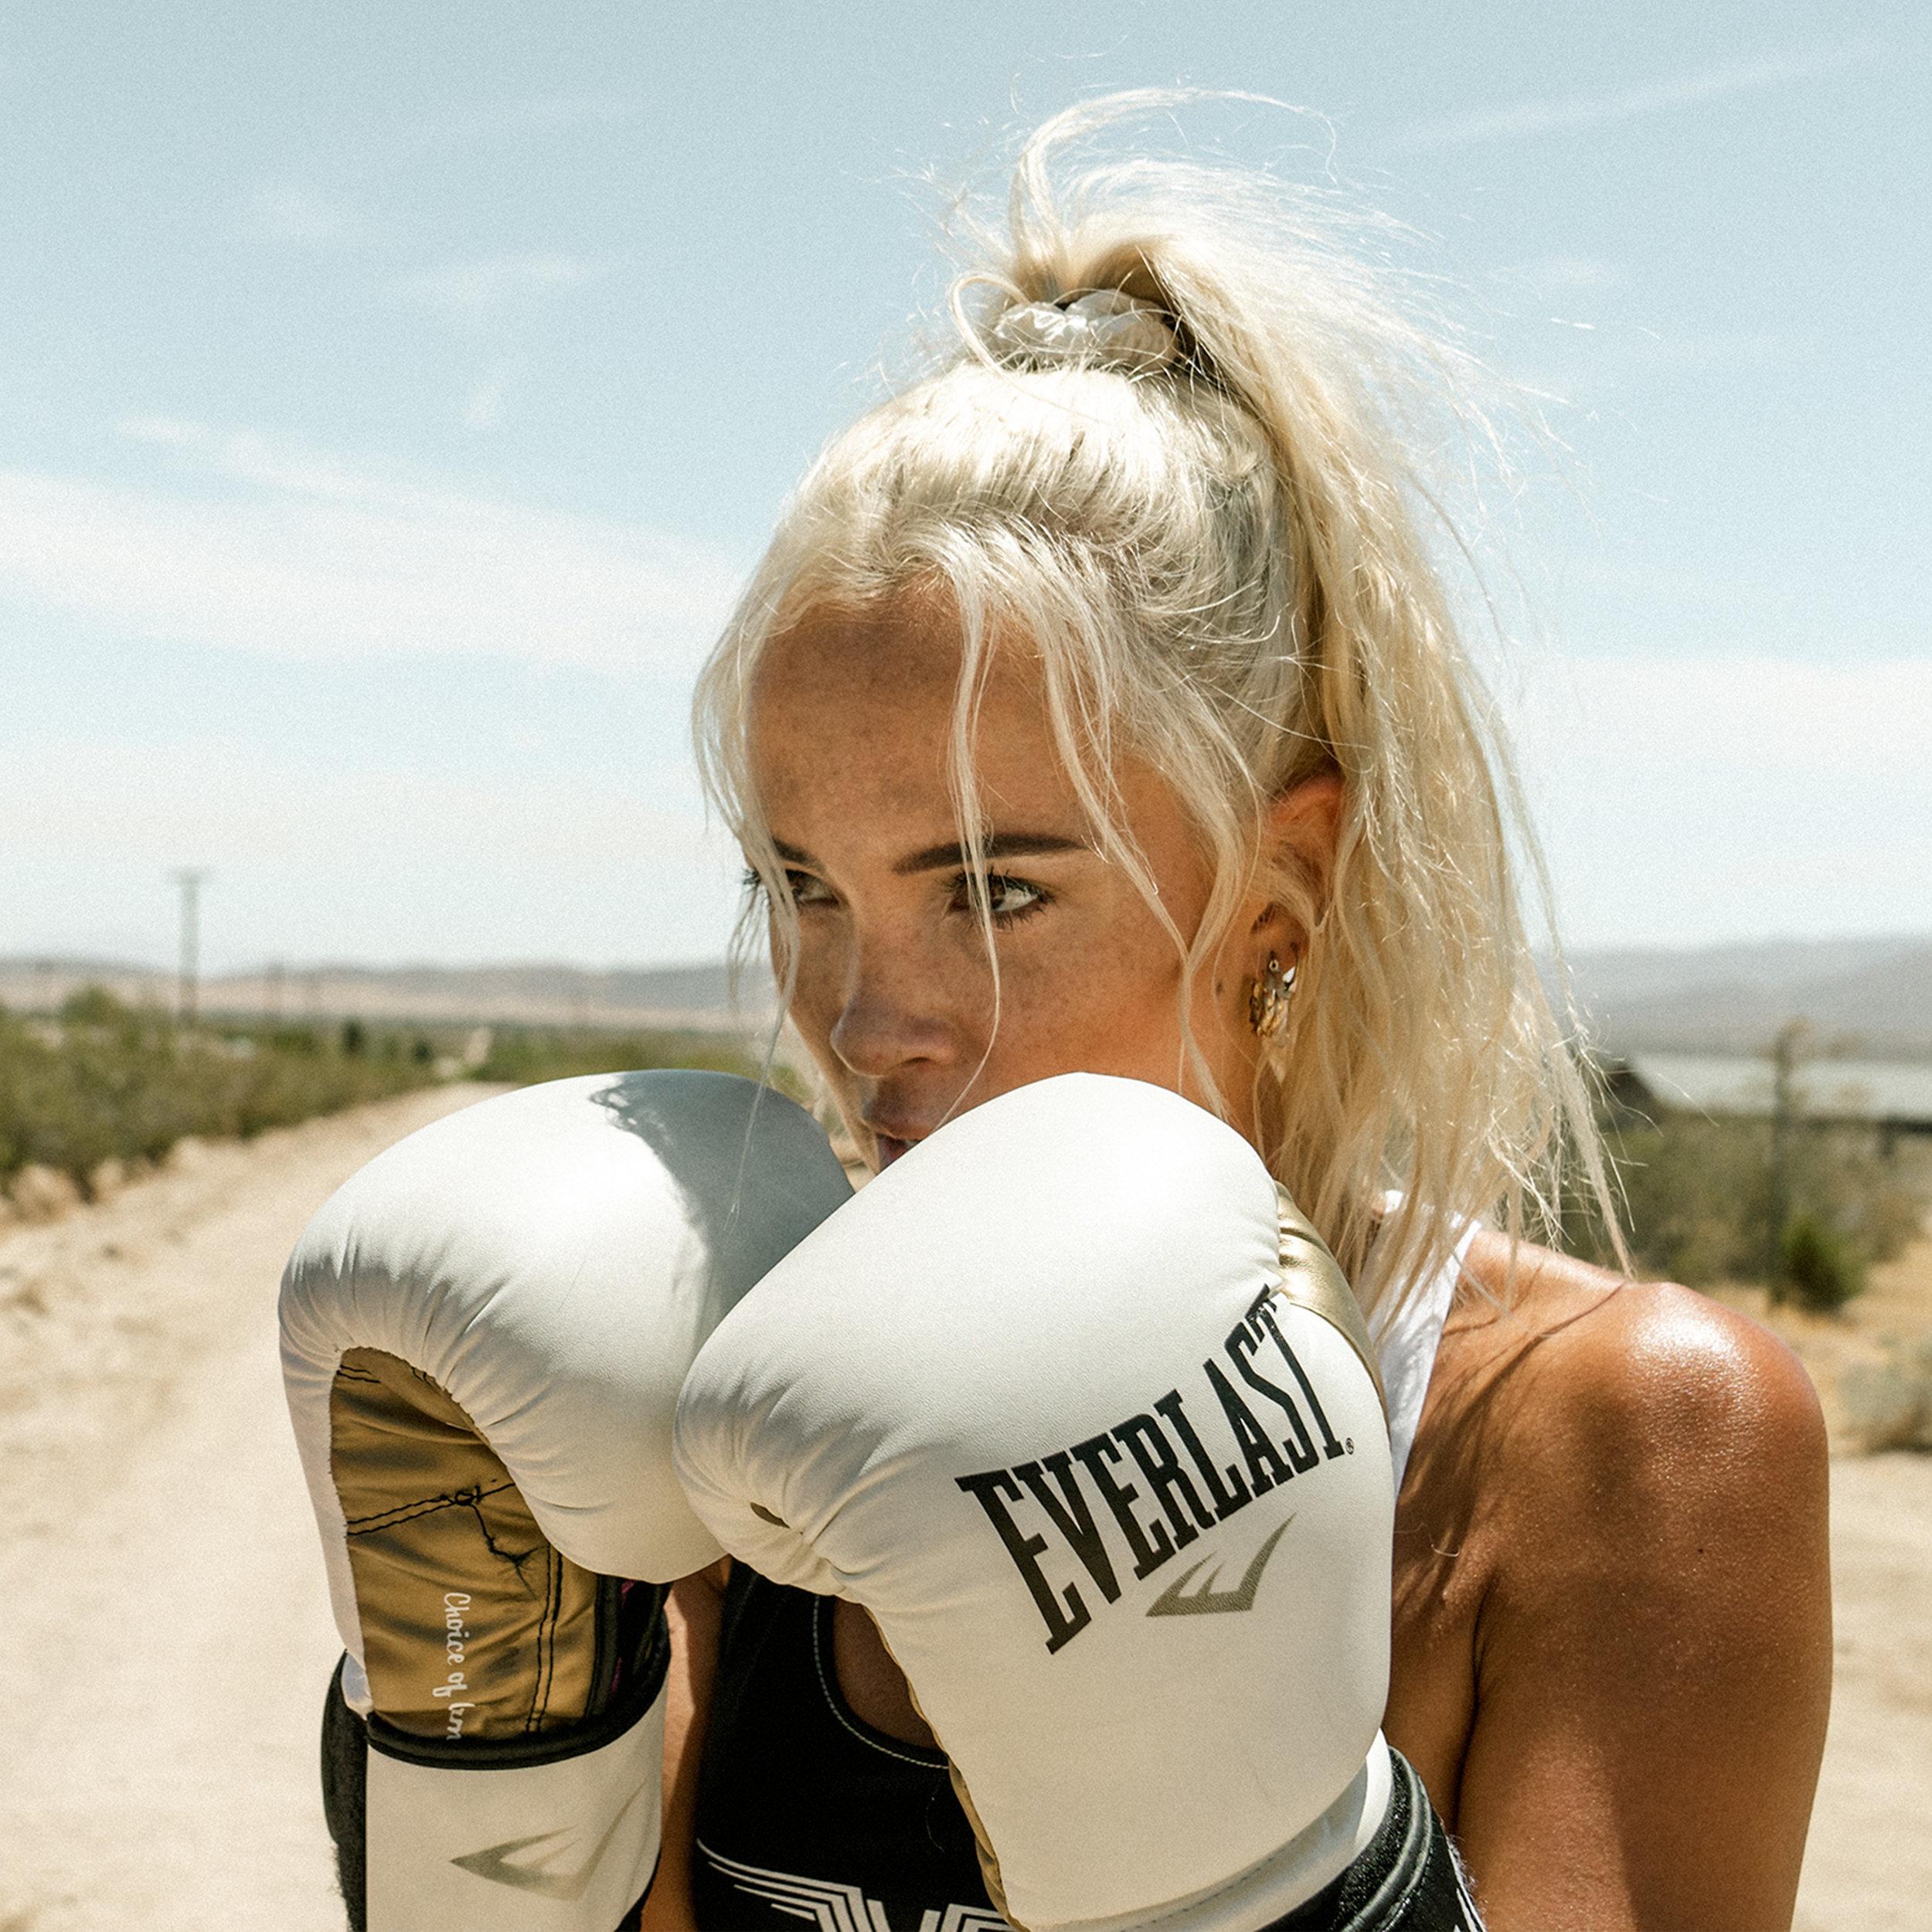 aisha boxing.jpg